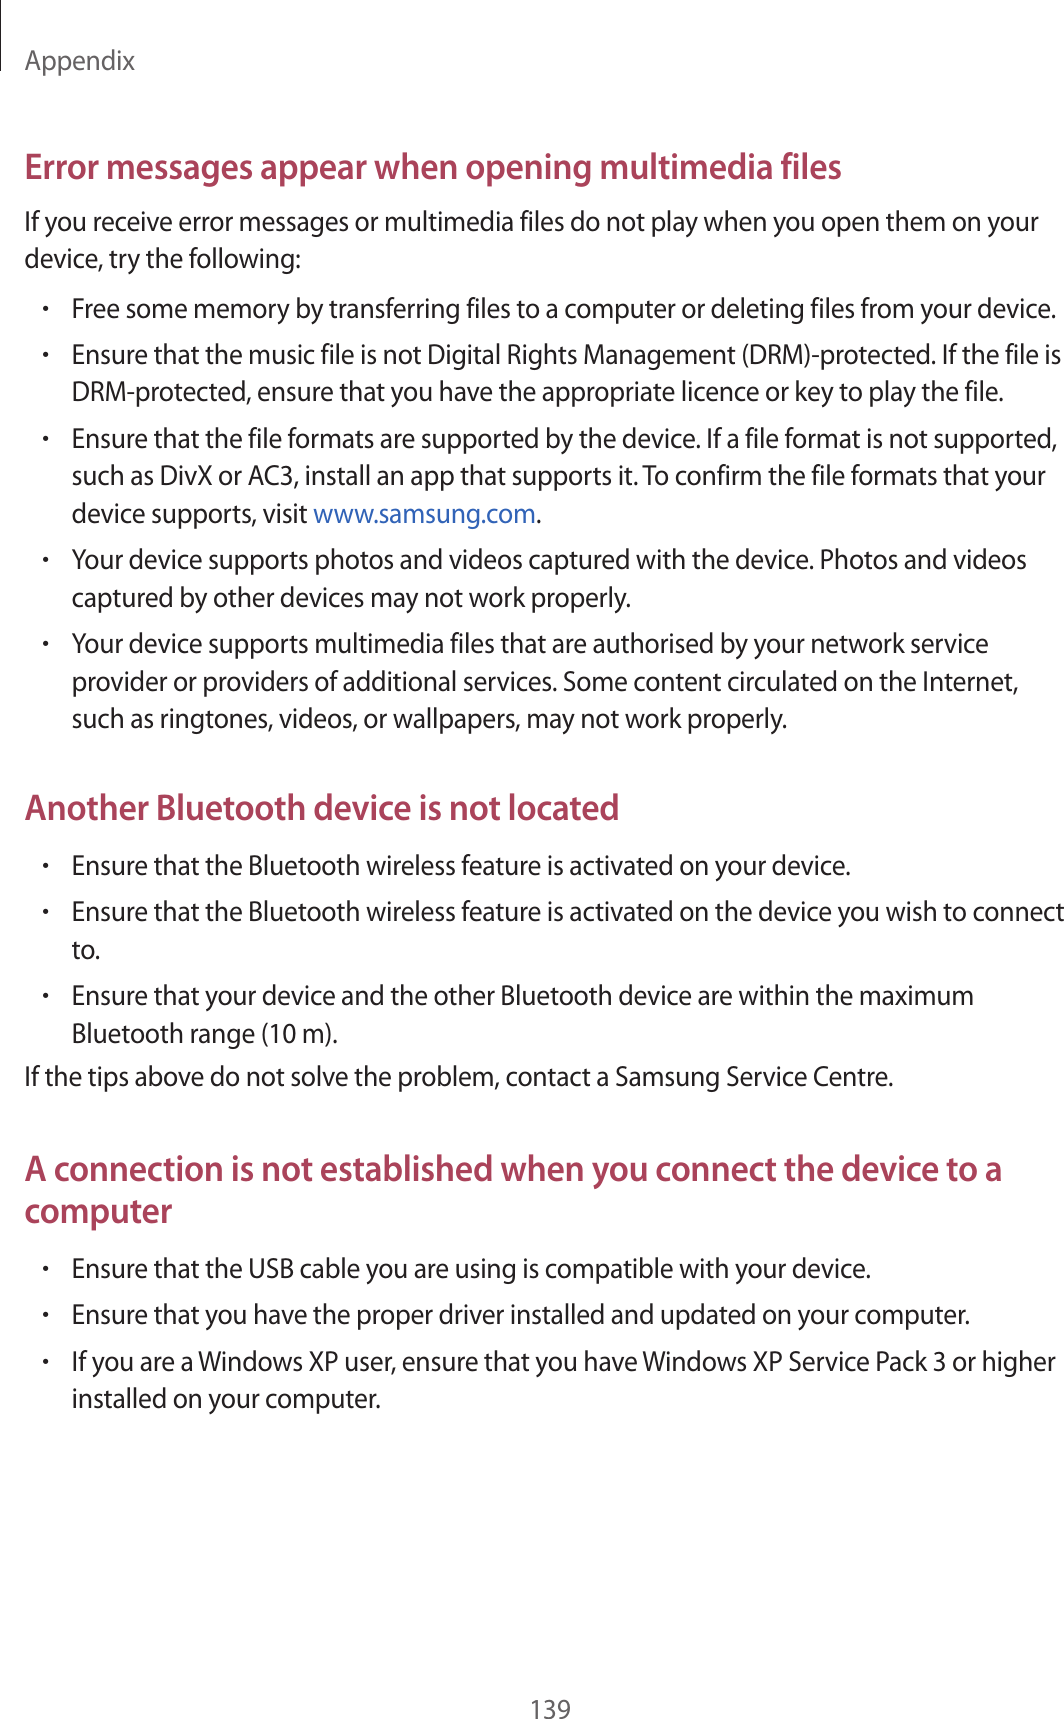 Samsung Galaxy J7 Pro Manual SM J530 J730 UM EU Nougat Eng Rev 1 0